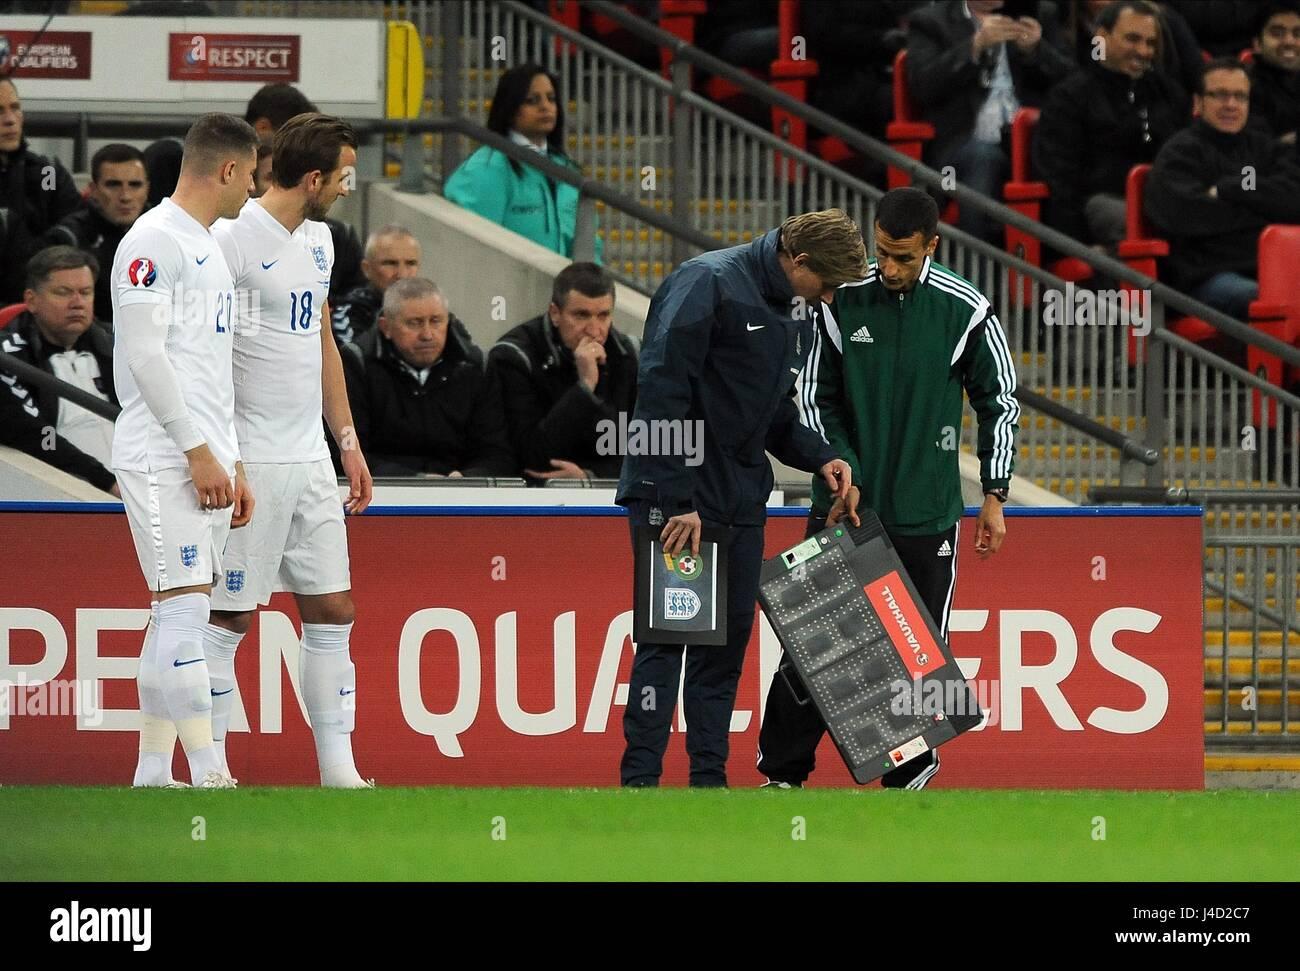 SUBSTITUTES HARRY KANE OF ENGL ENGLAND V LITHUANIA WEMBLEY STADIUM LONDON ENGLAND 27 March 2015 - Stock Image